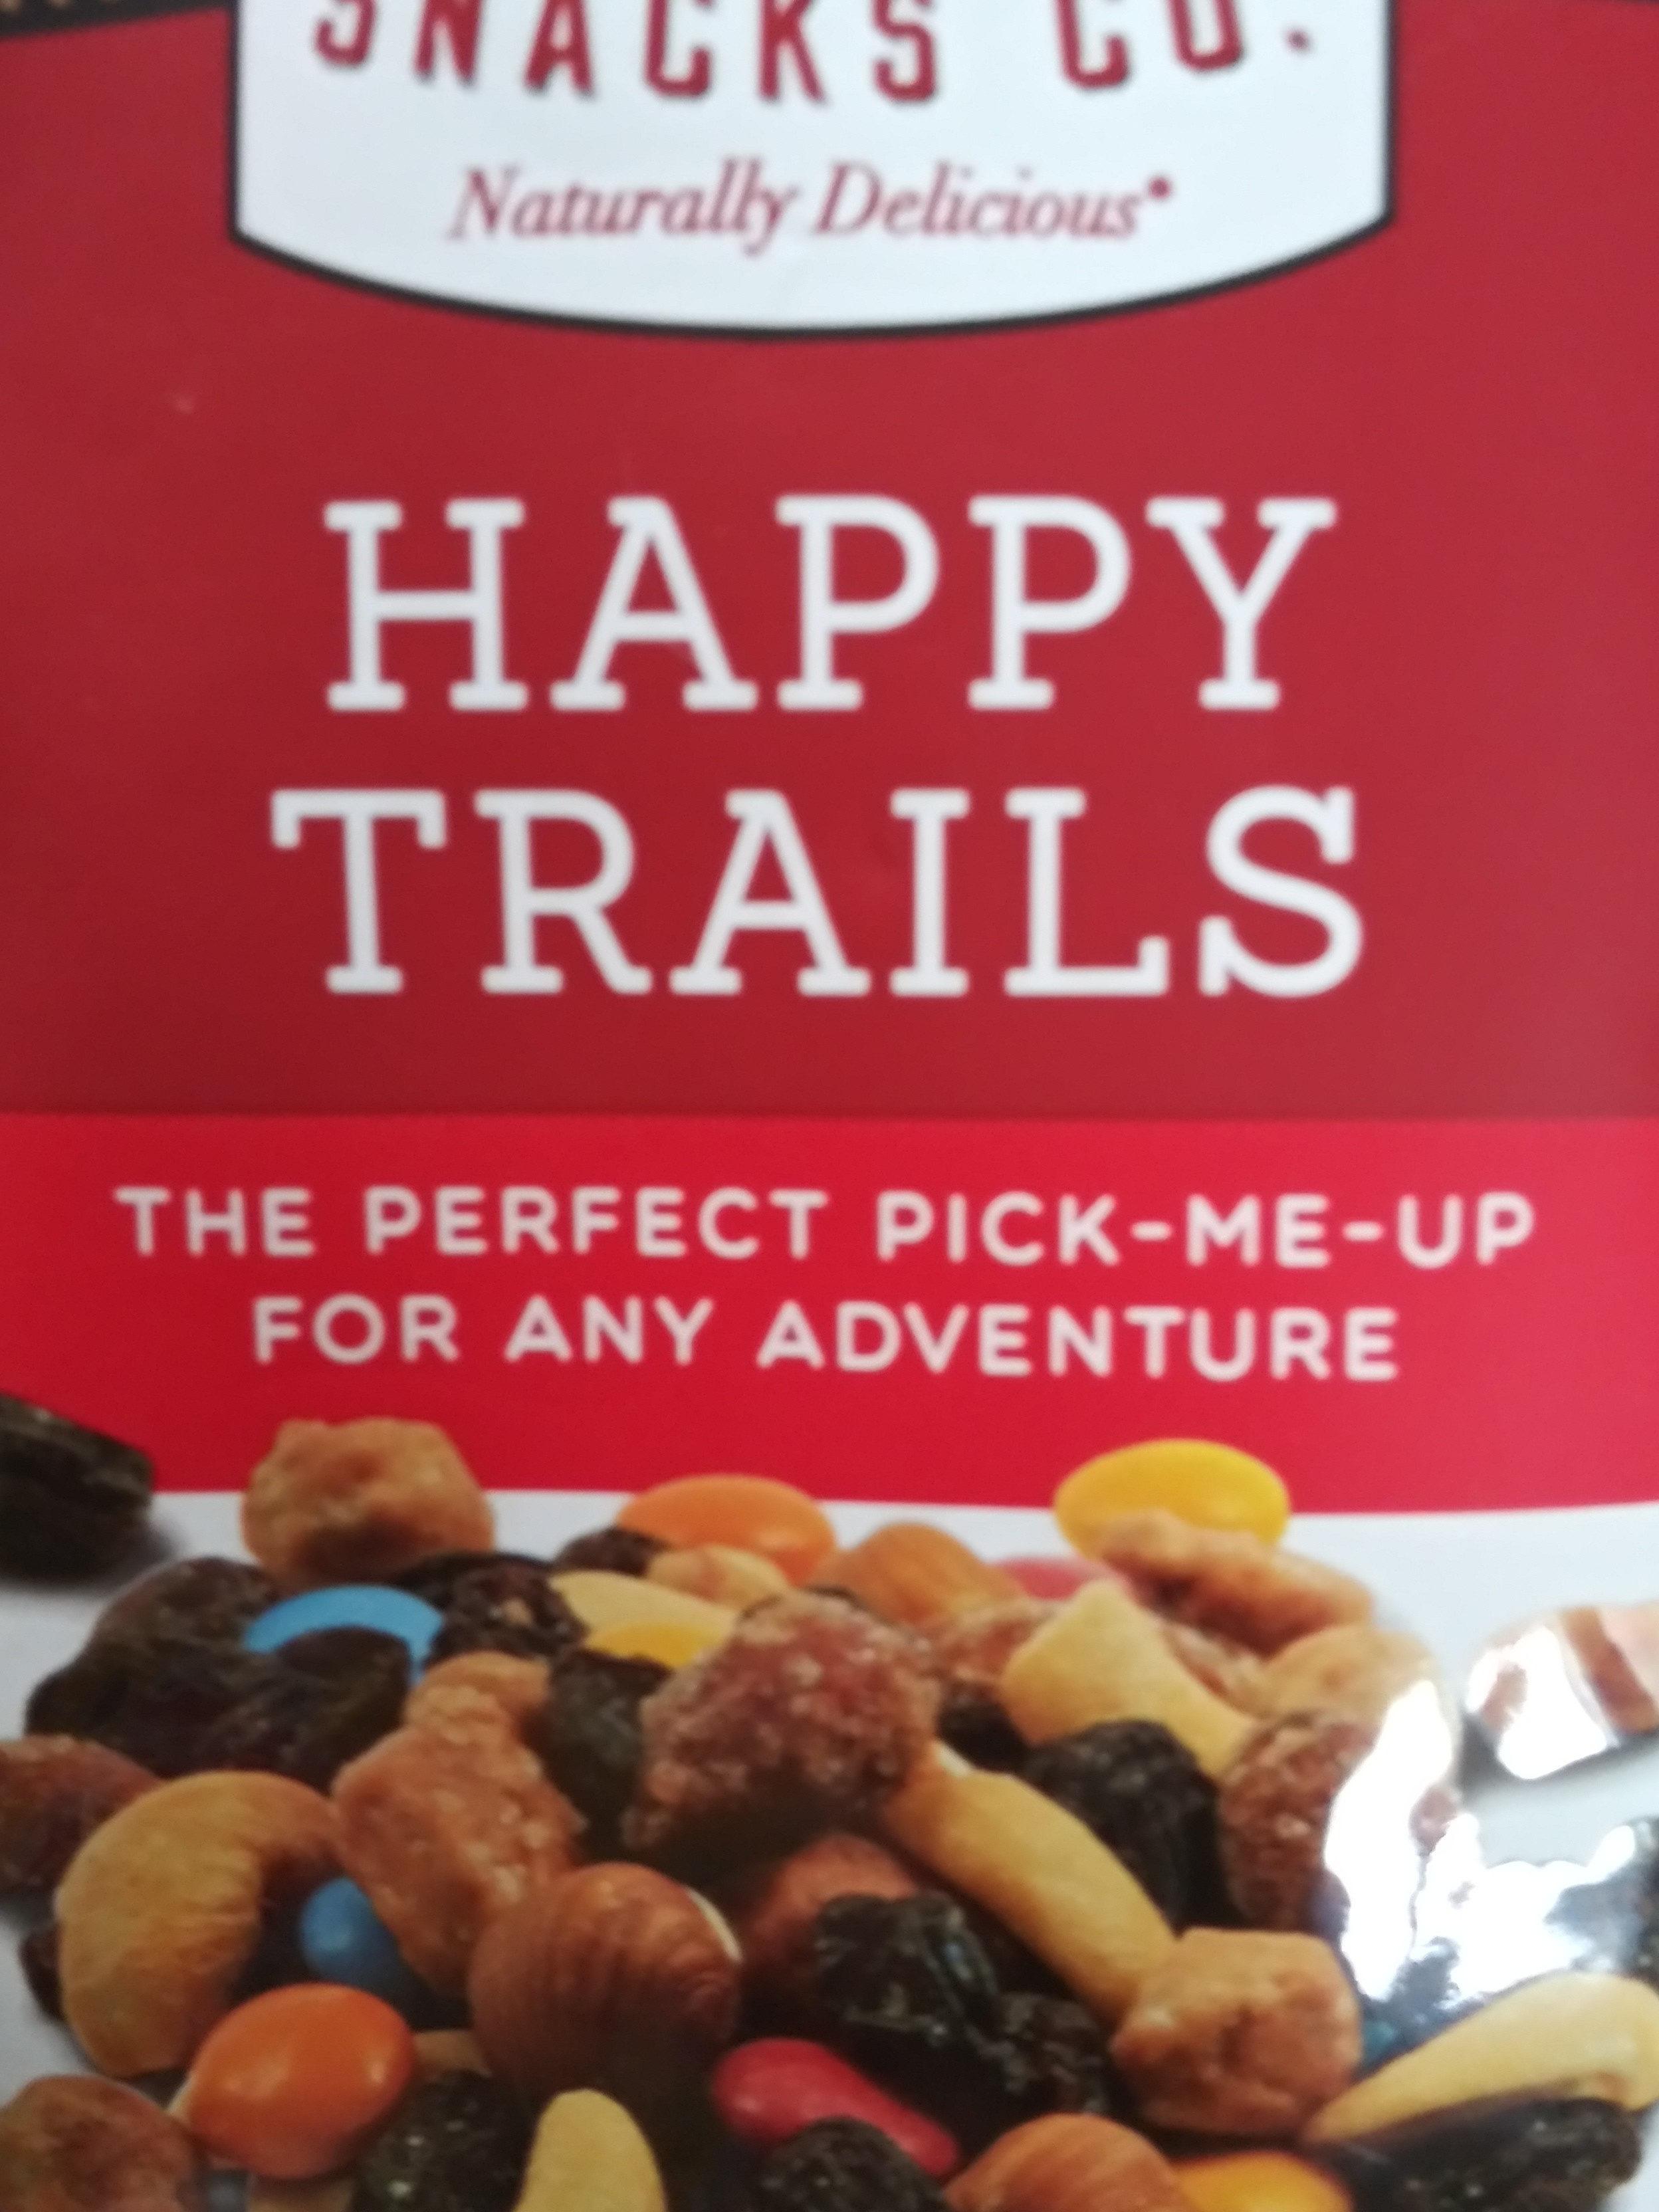 creative snacks happy trails - Product